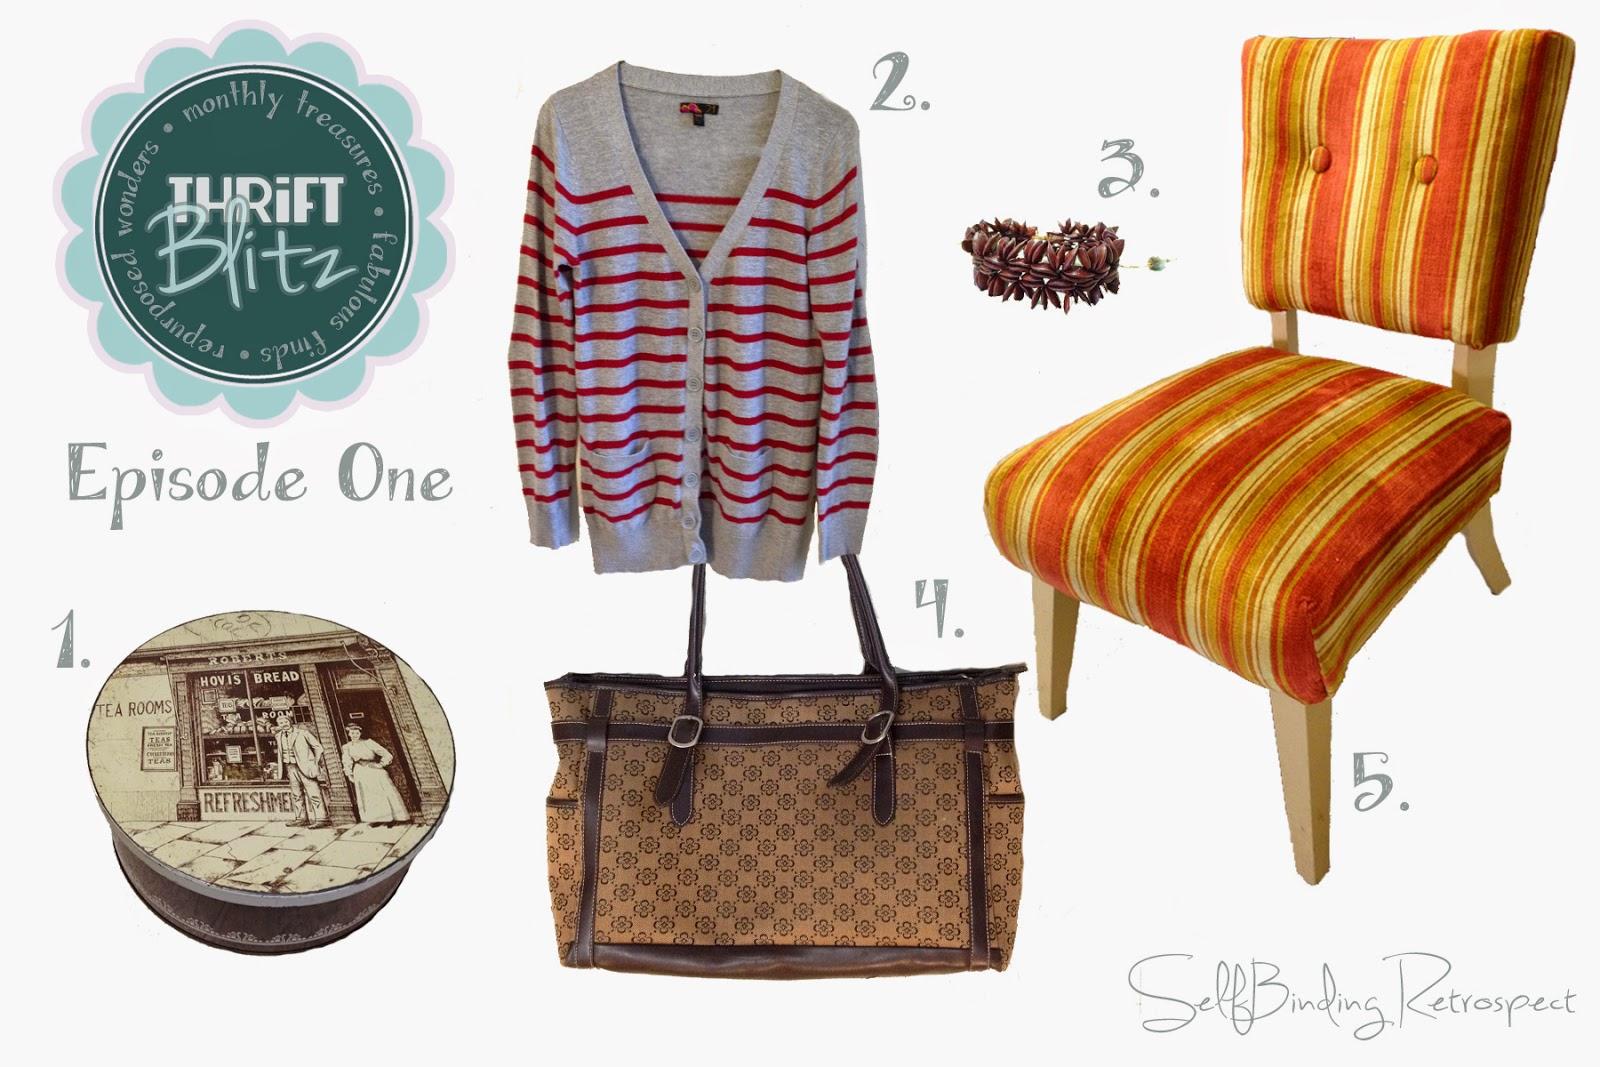 Thrift Blitz Episode One - SelfBinding Retrospect by Alanna Rusnak